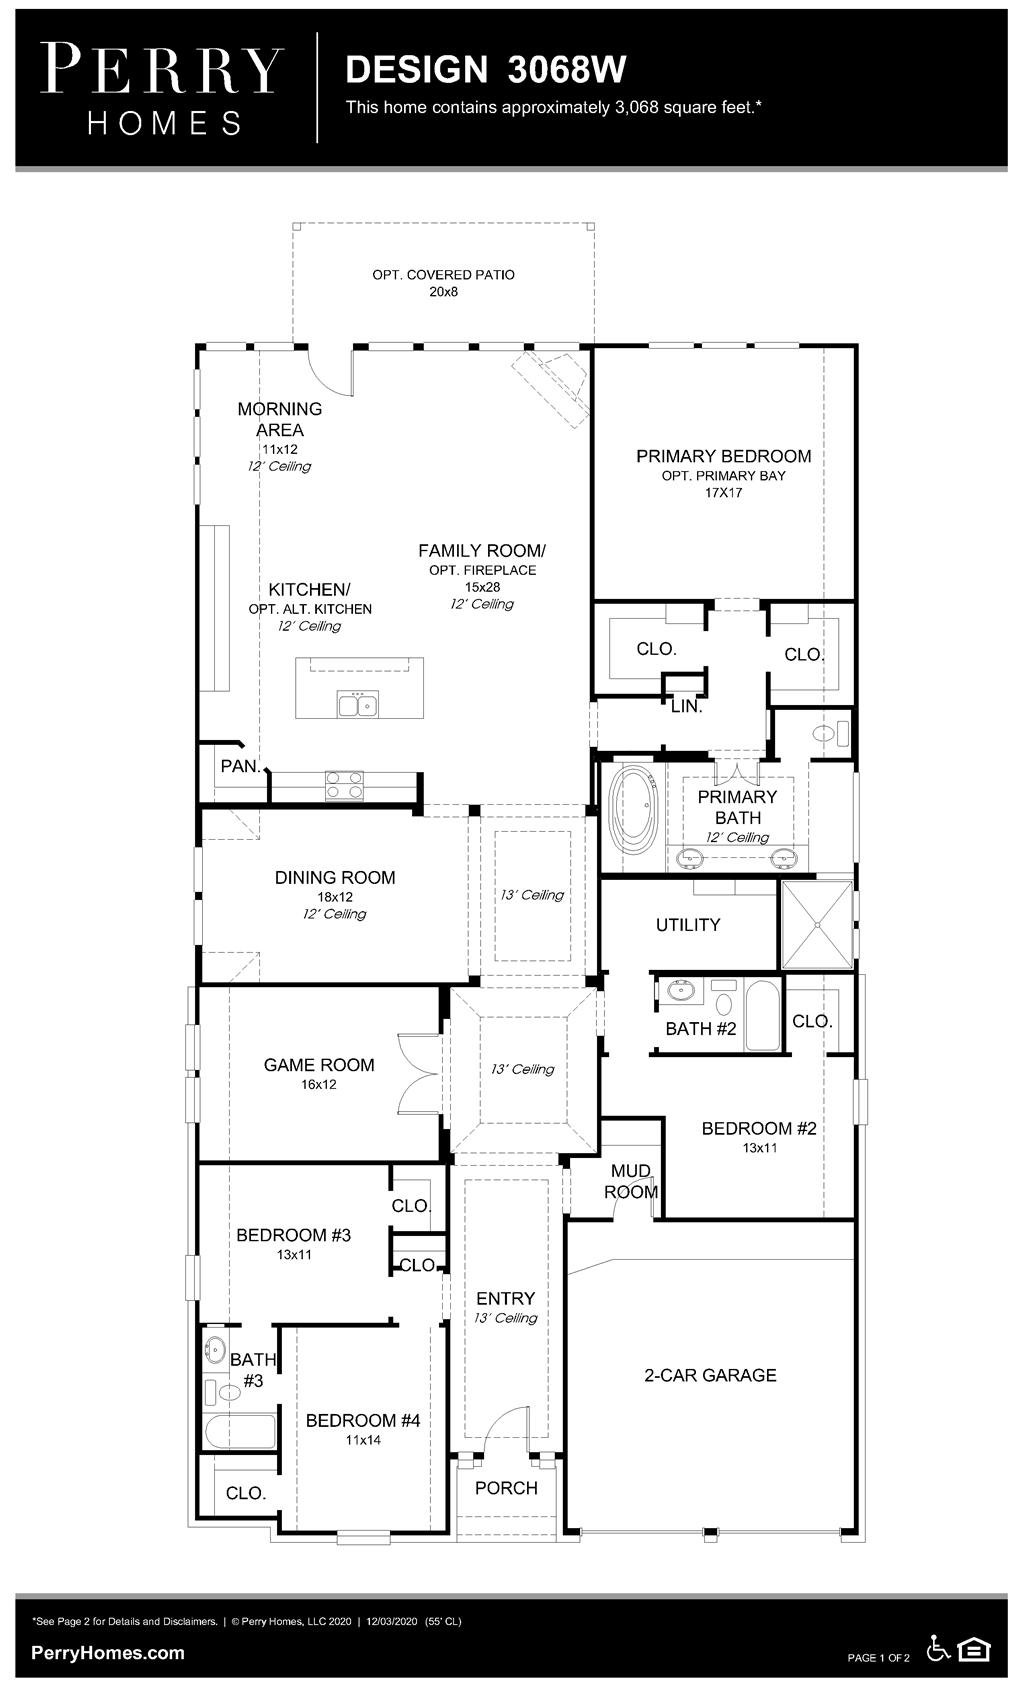 Floor Plan for 3068W